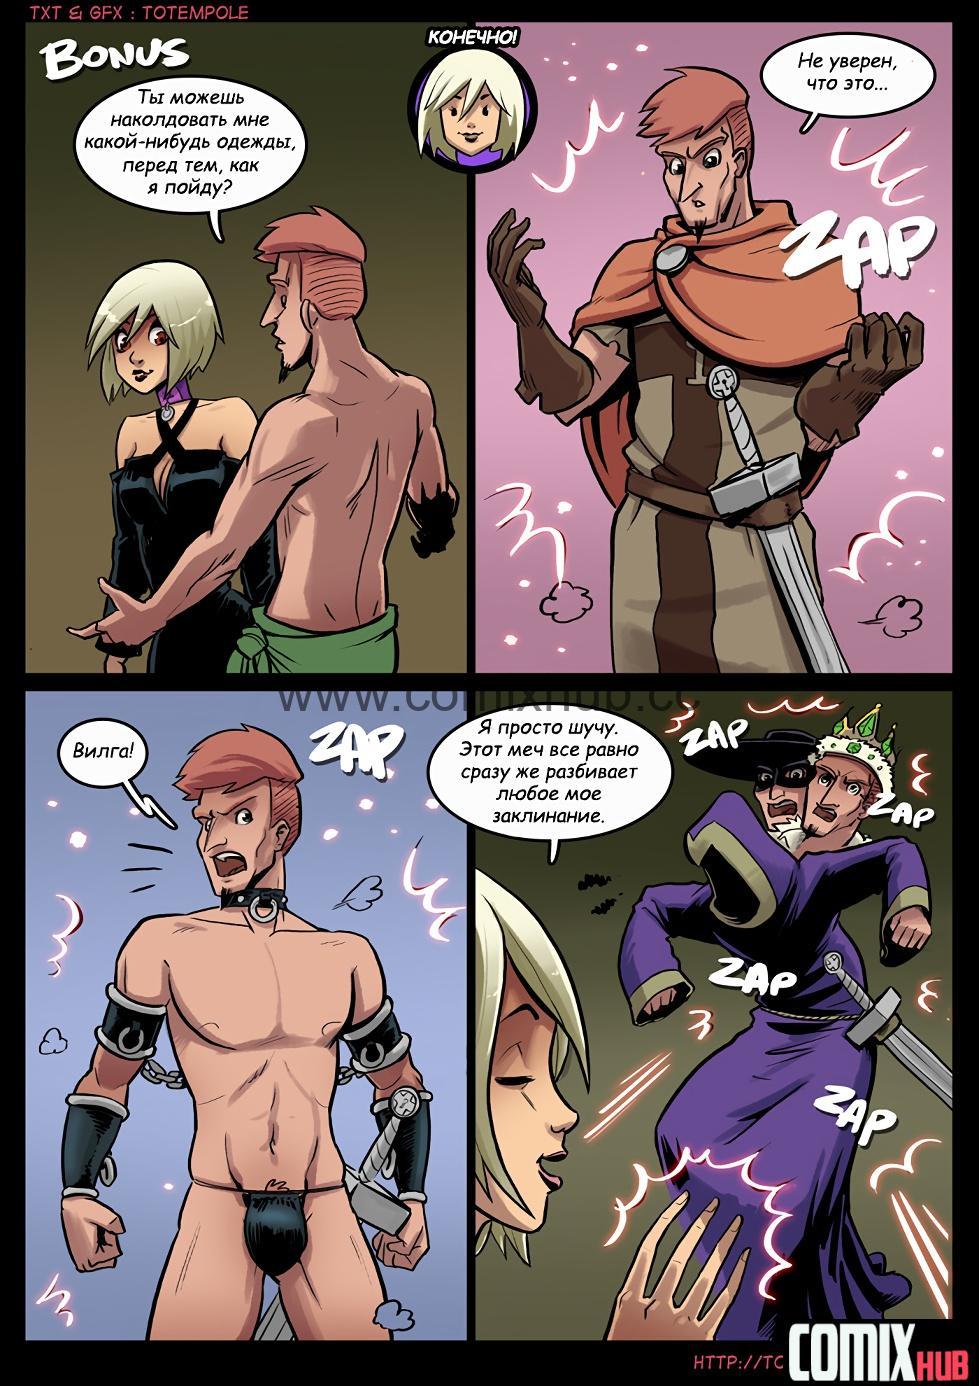 Порно комикс Волшебница, часть 13 Порно комиксы, Групповой секс, Лесбиянки